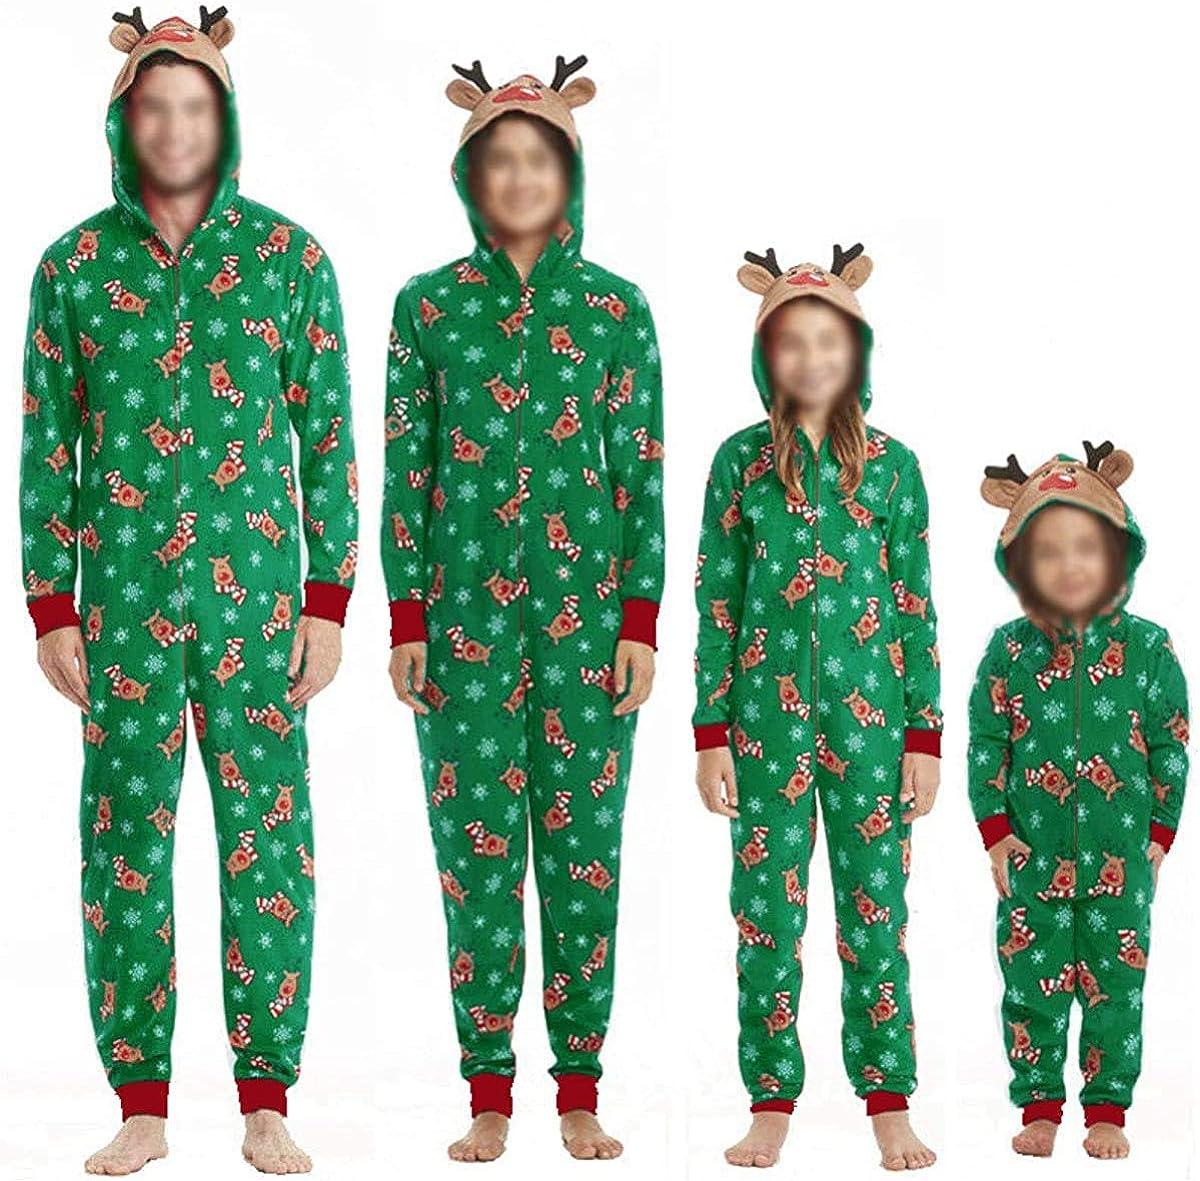 Huyghdfb Family Christmas Matching Pajamas Kids Baby Dog Xmas ...